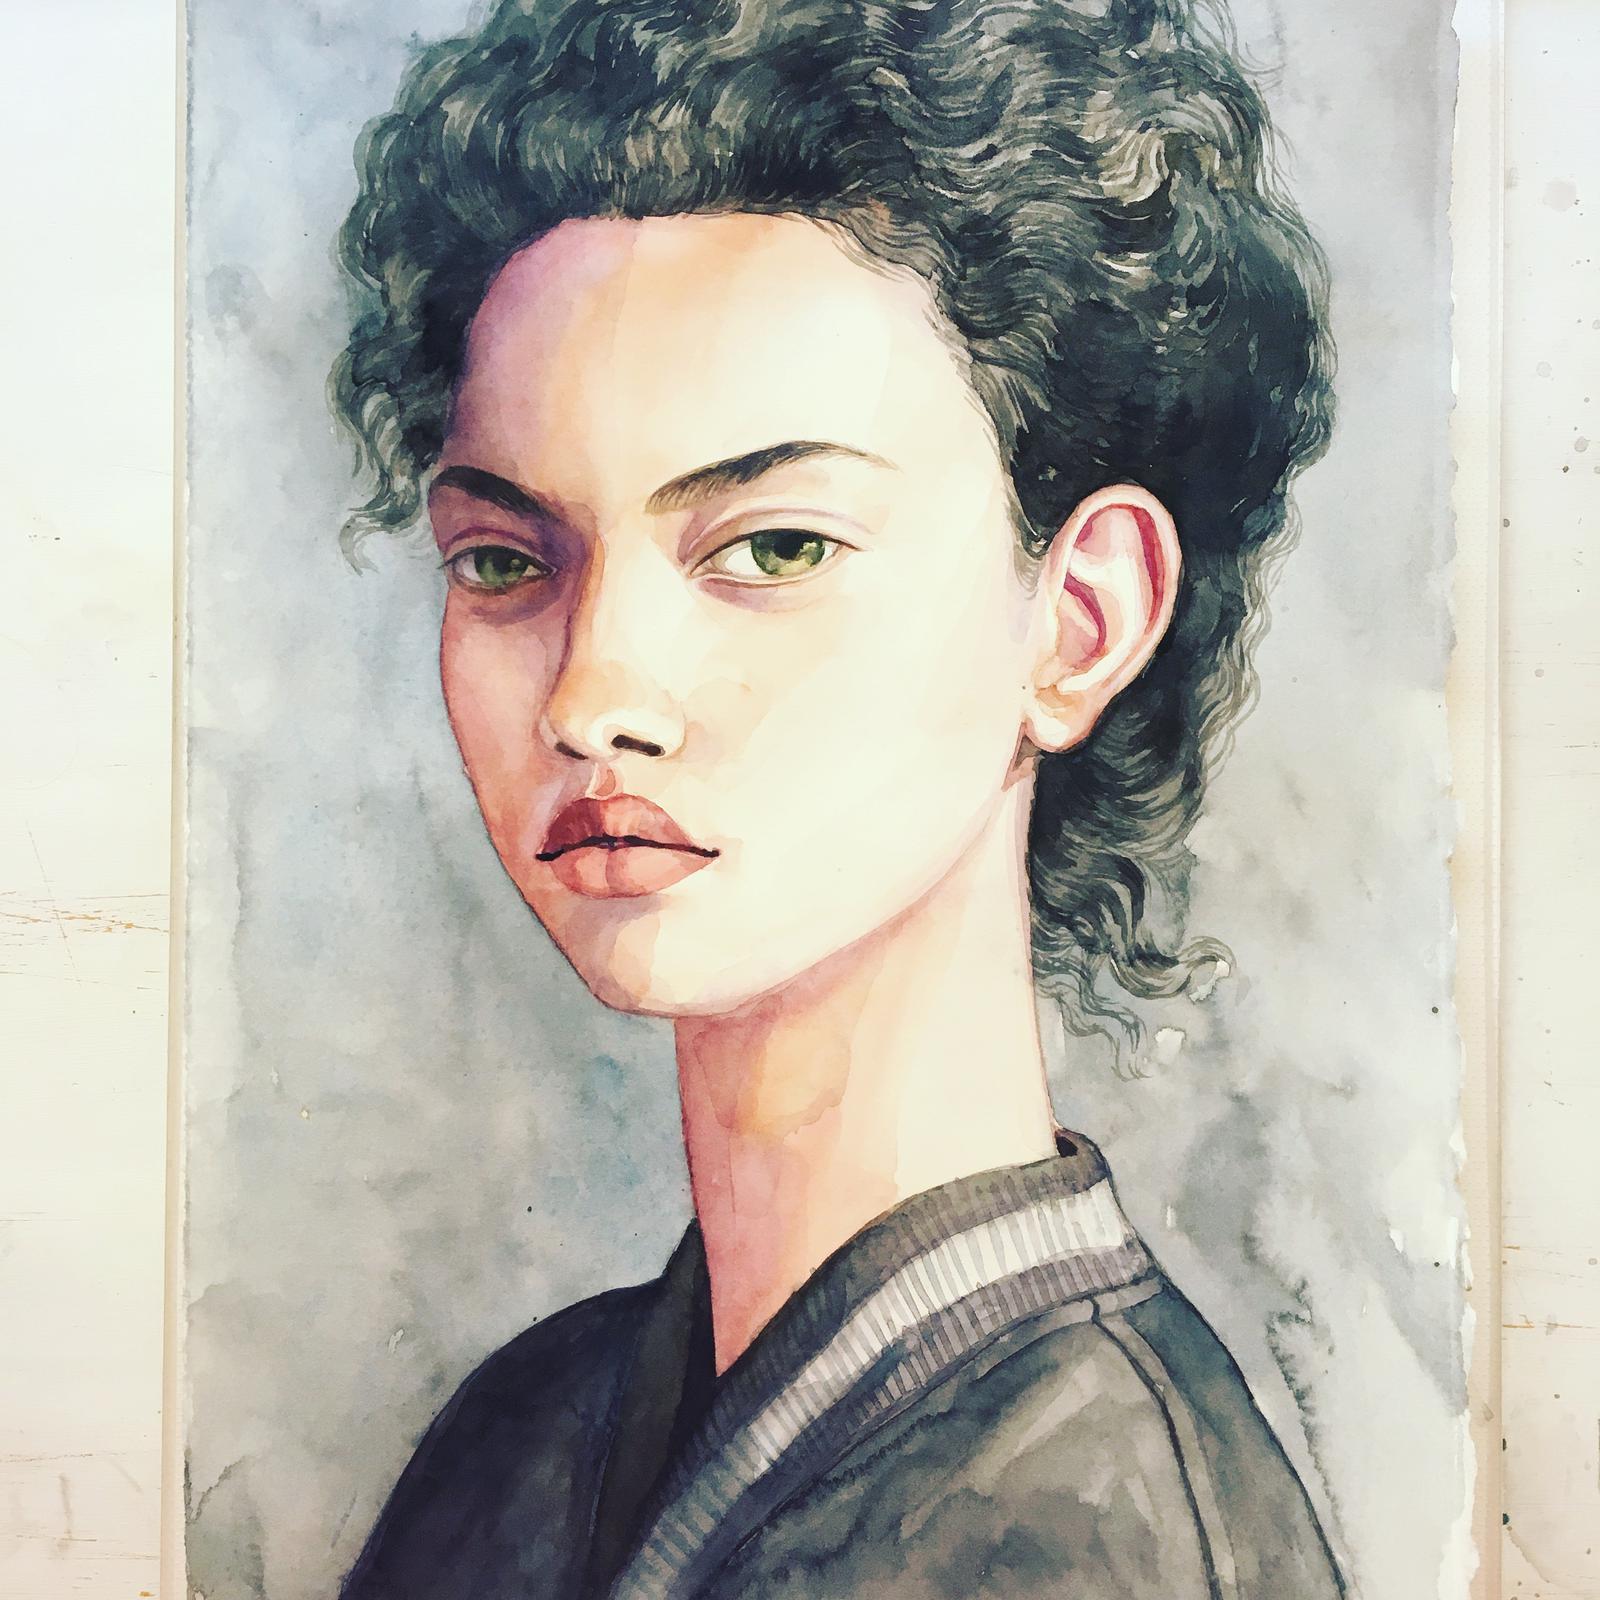 Sample of a portrait (watercolor)